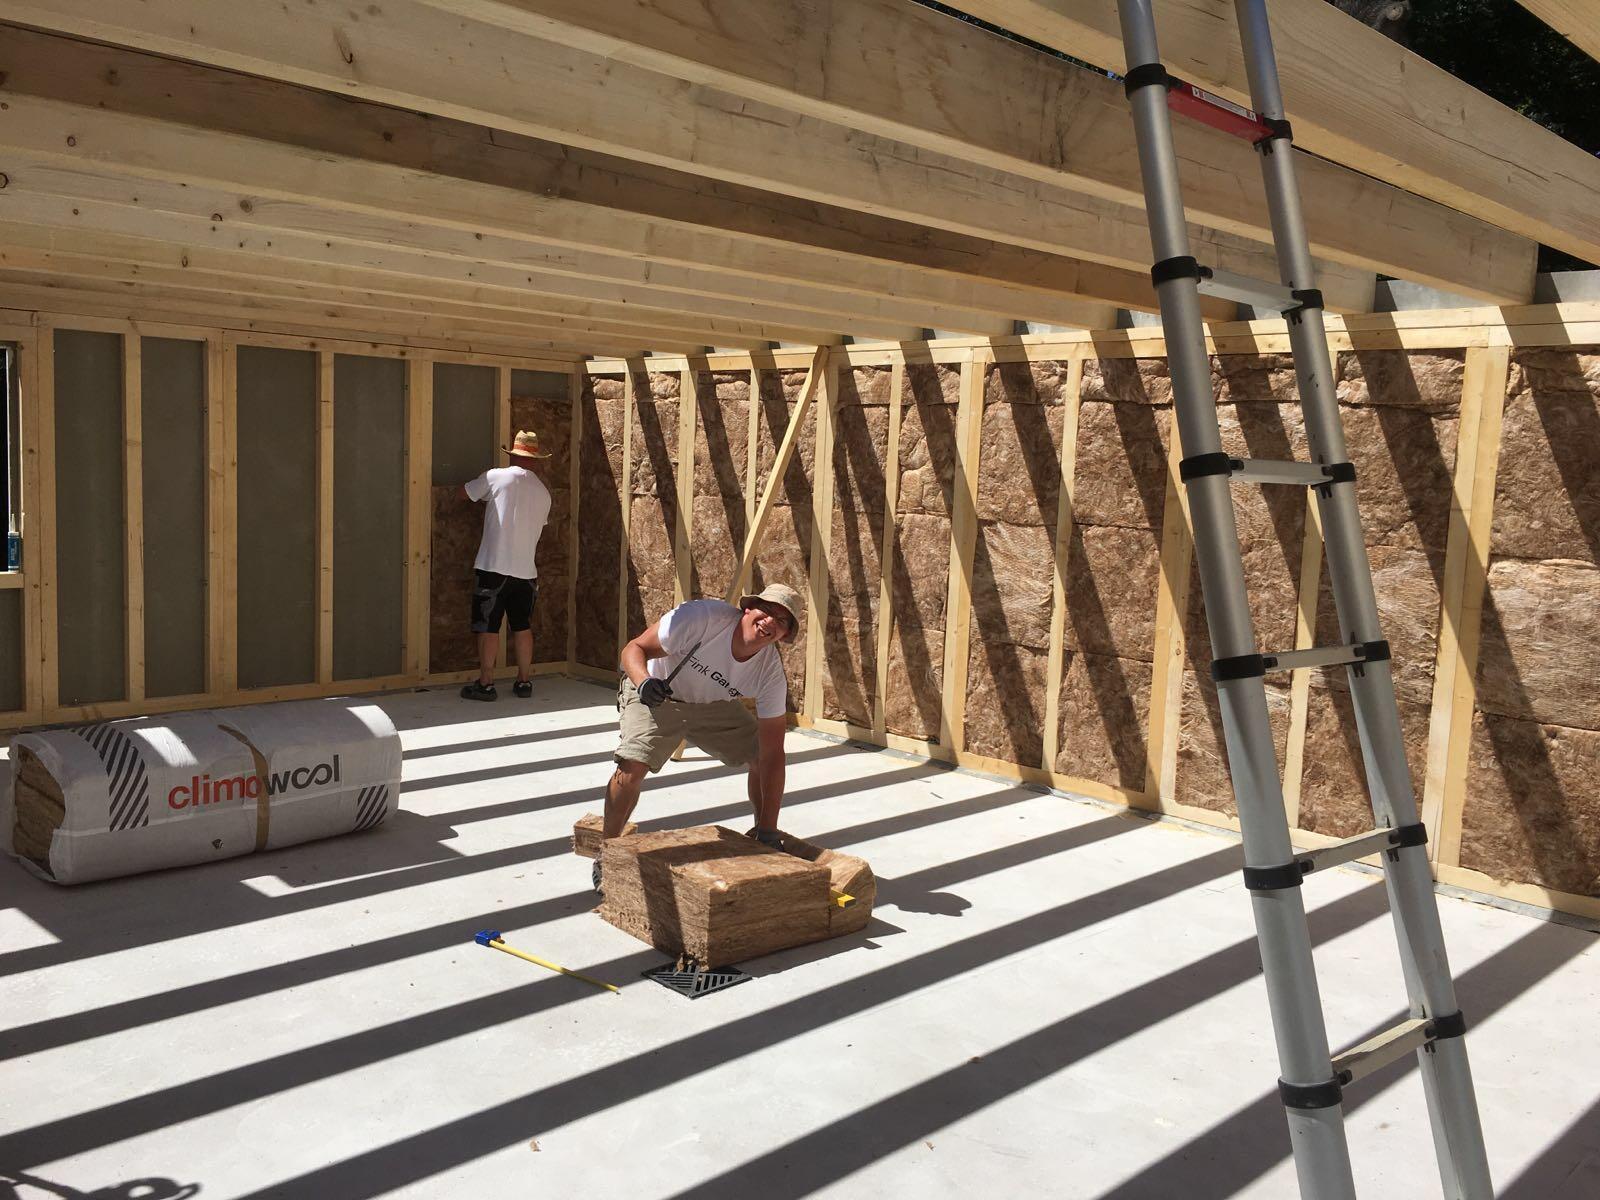 fundament garage ilka halli luca galerie kategorie fundament garage bild fundament garage 11. Black Bedroom Furniture Sets. Home Design Ideas